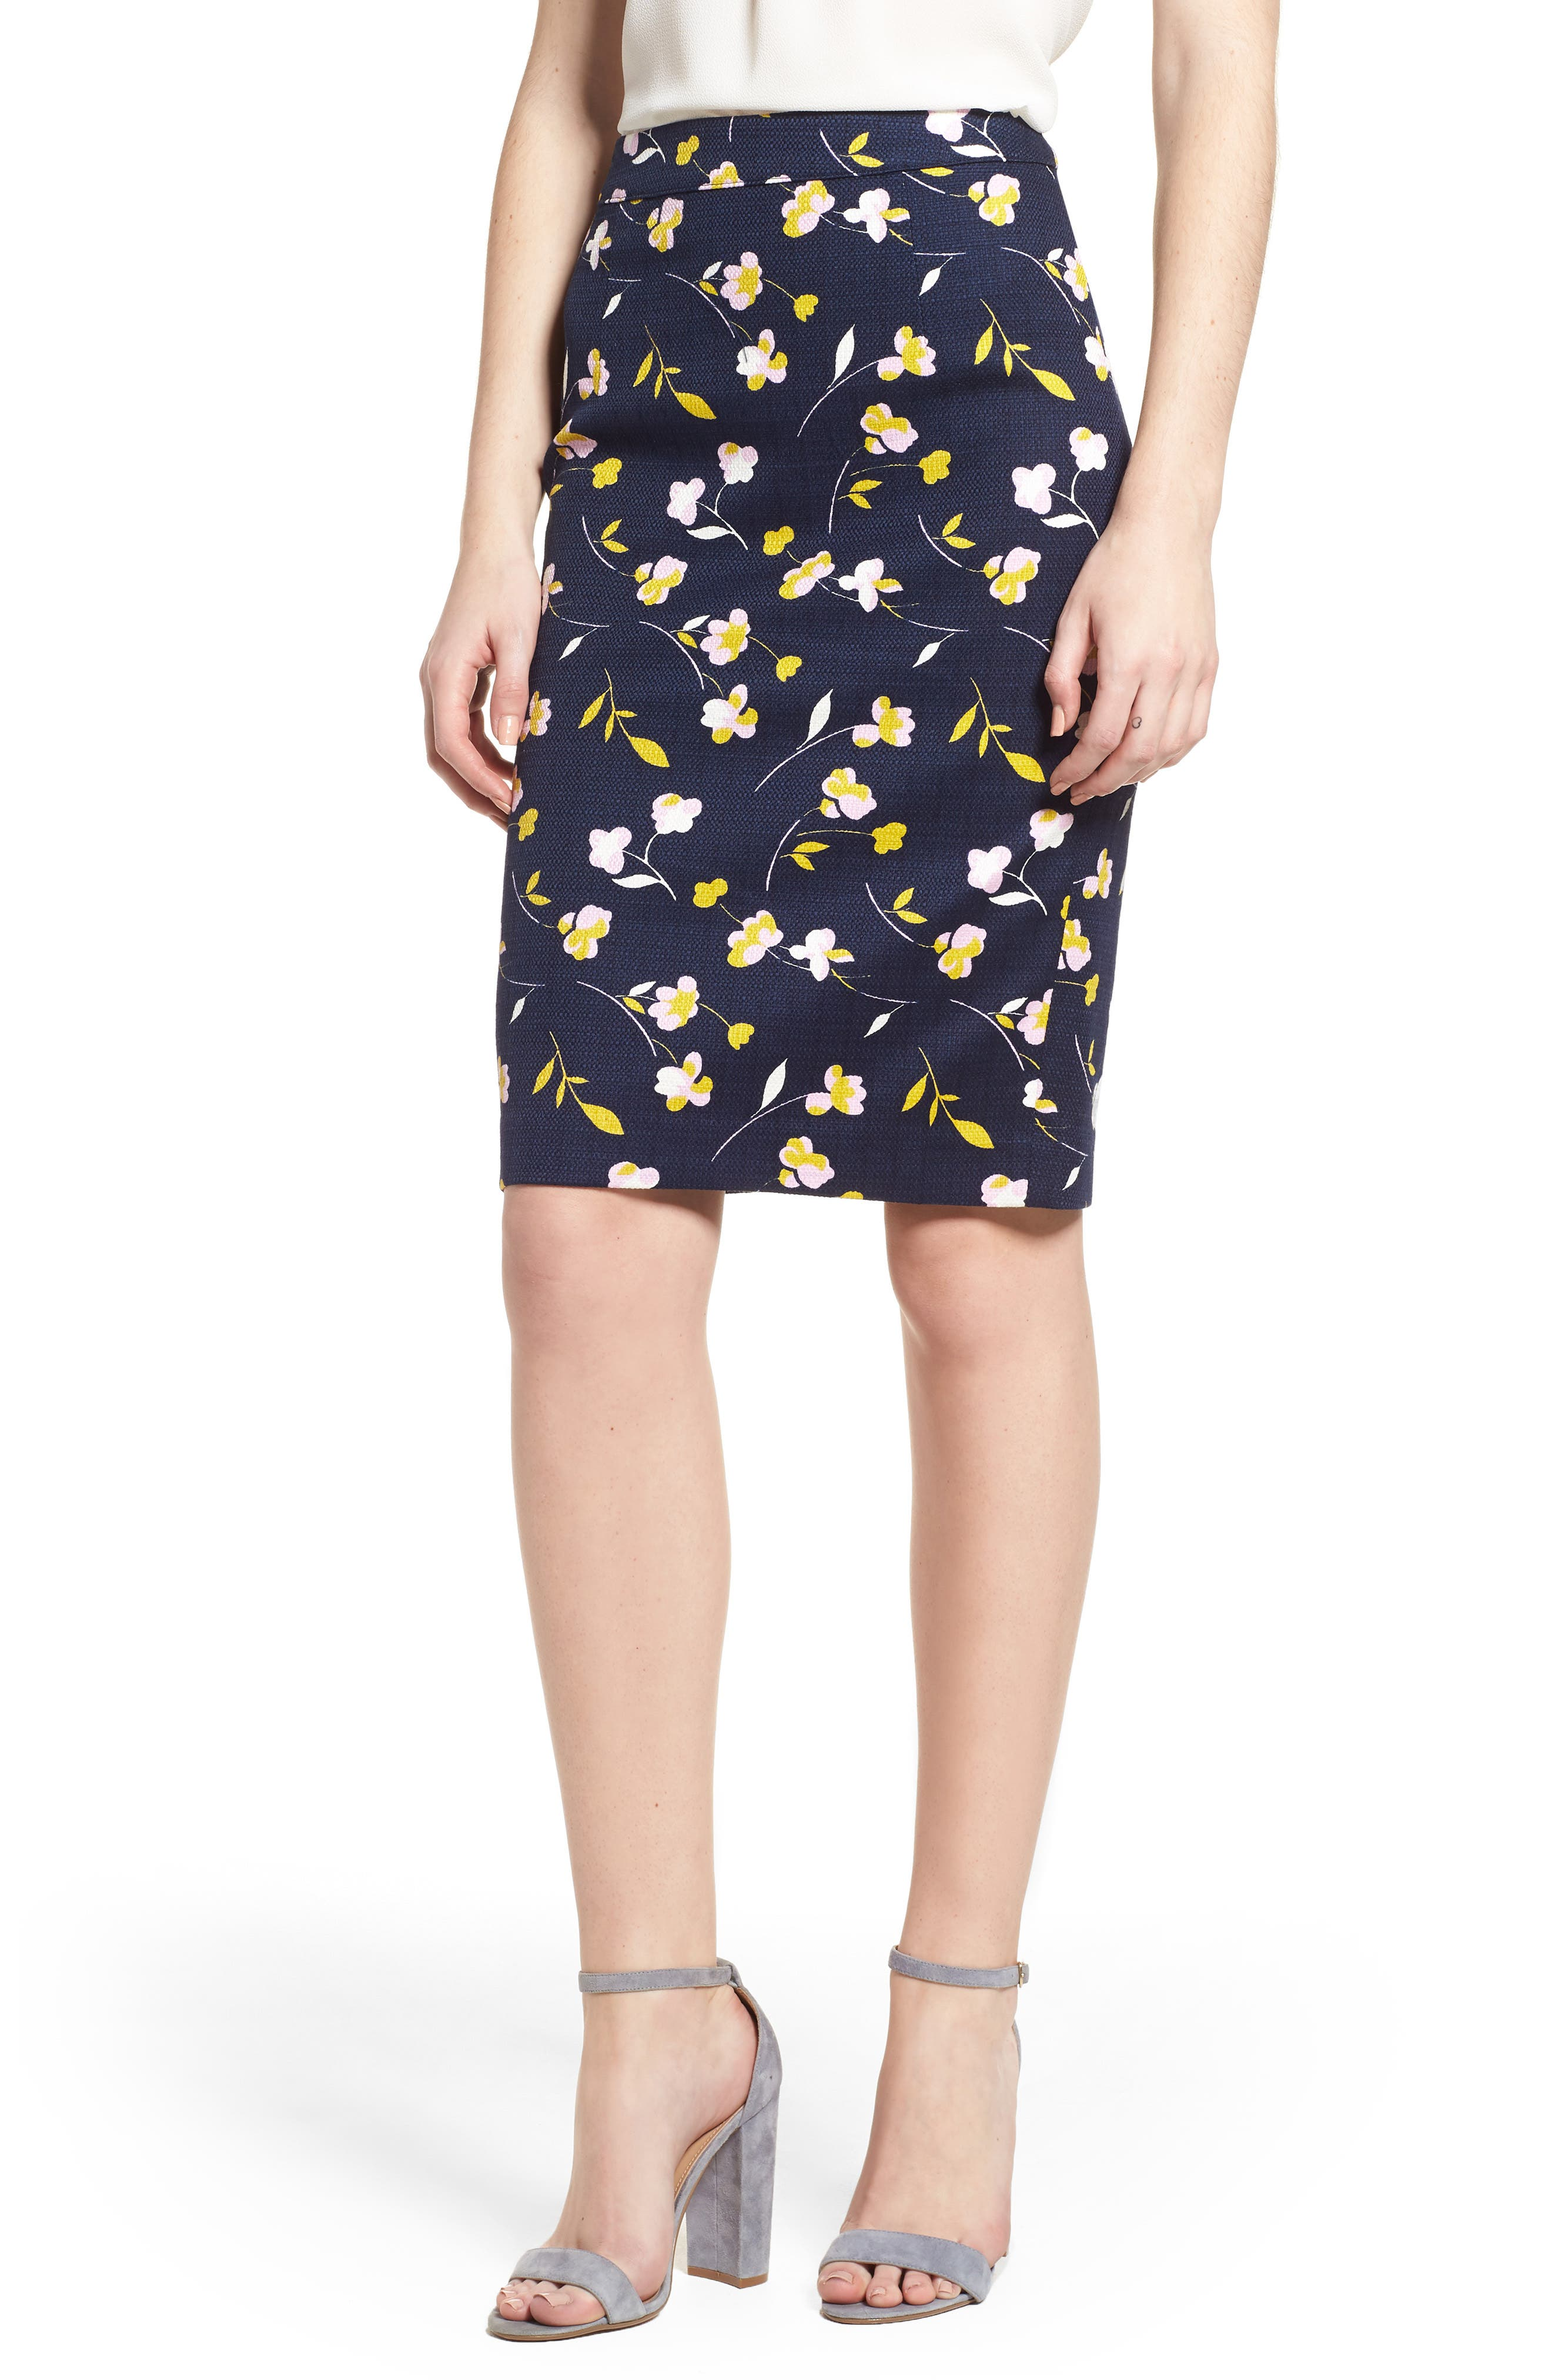 Boden Martha Floral Pencil Skirt